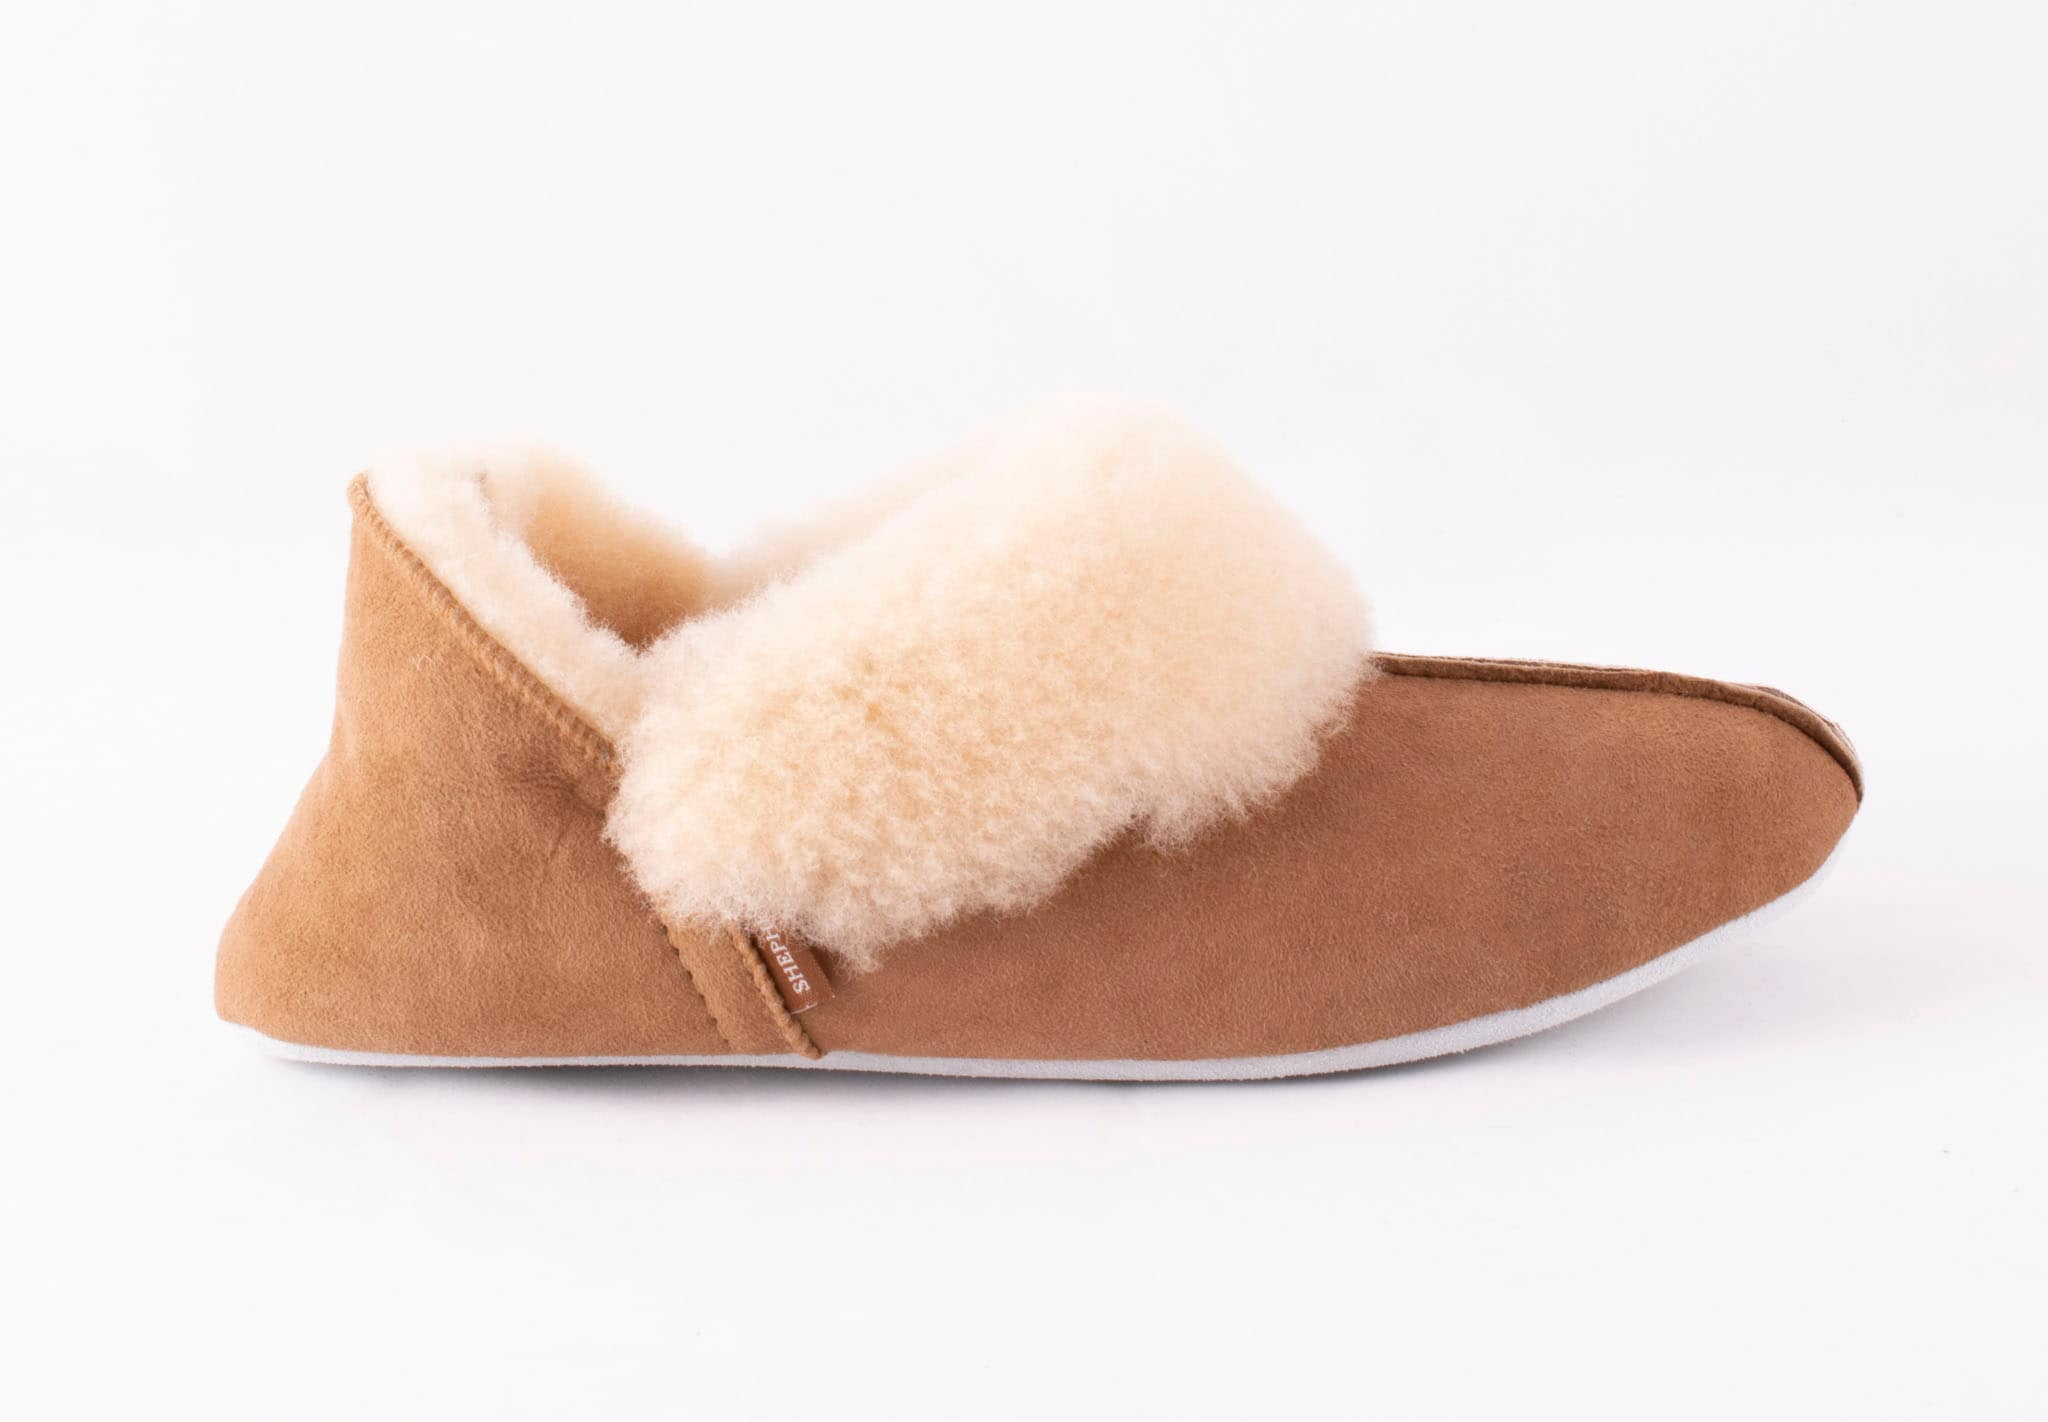 Ljung slippers Chestnut